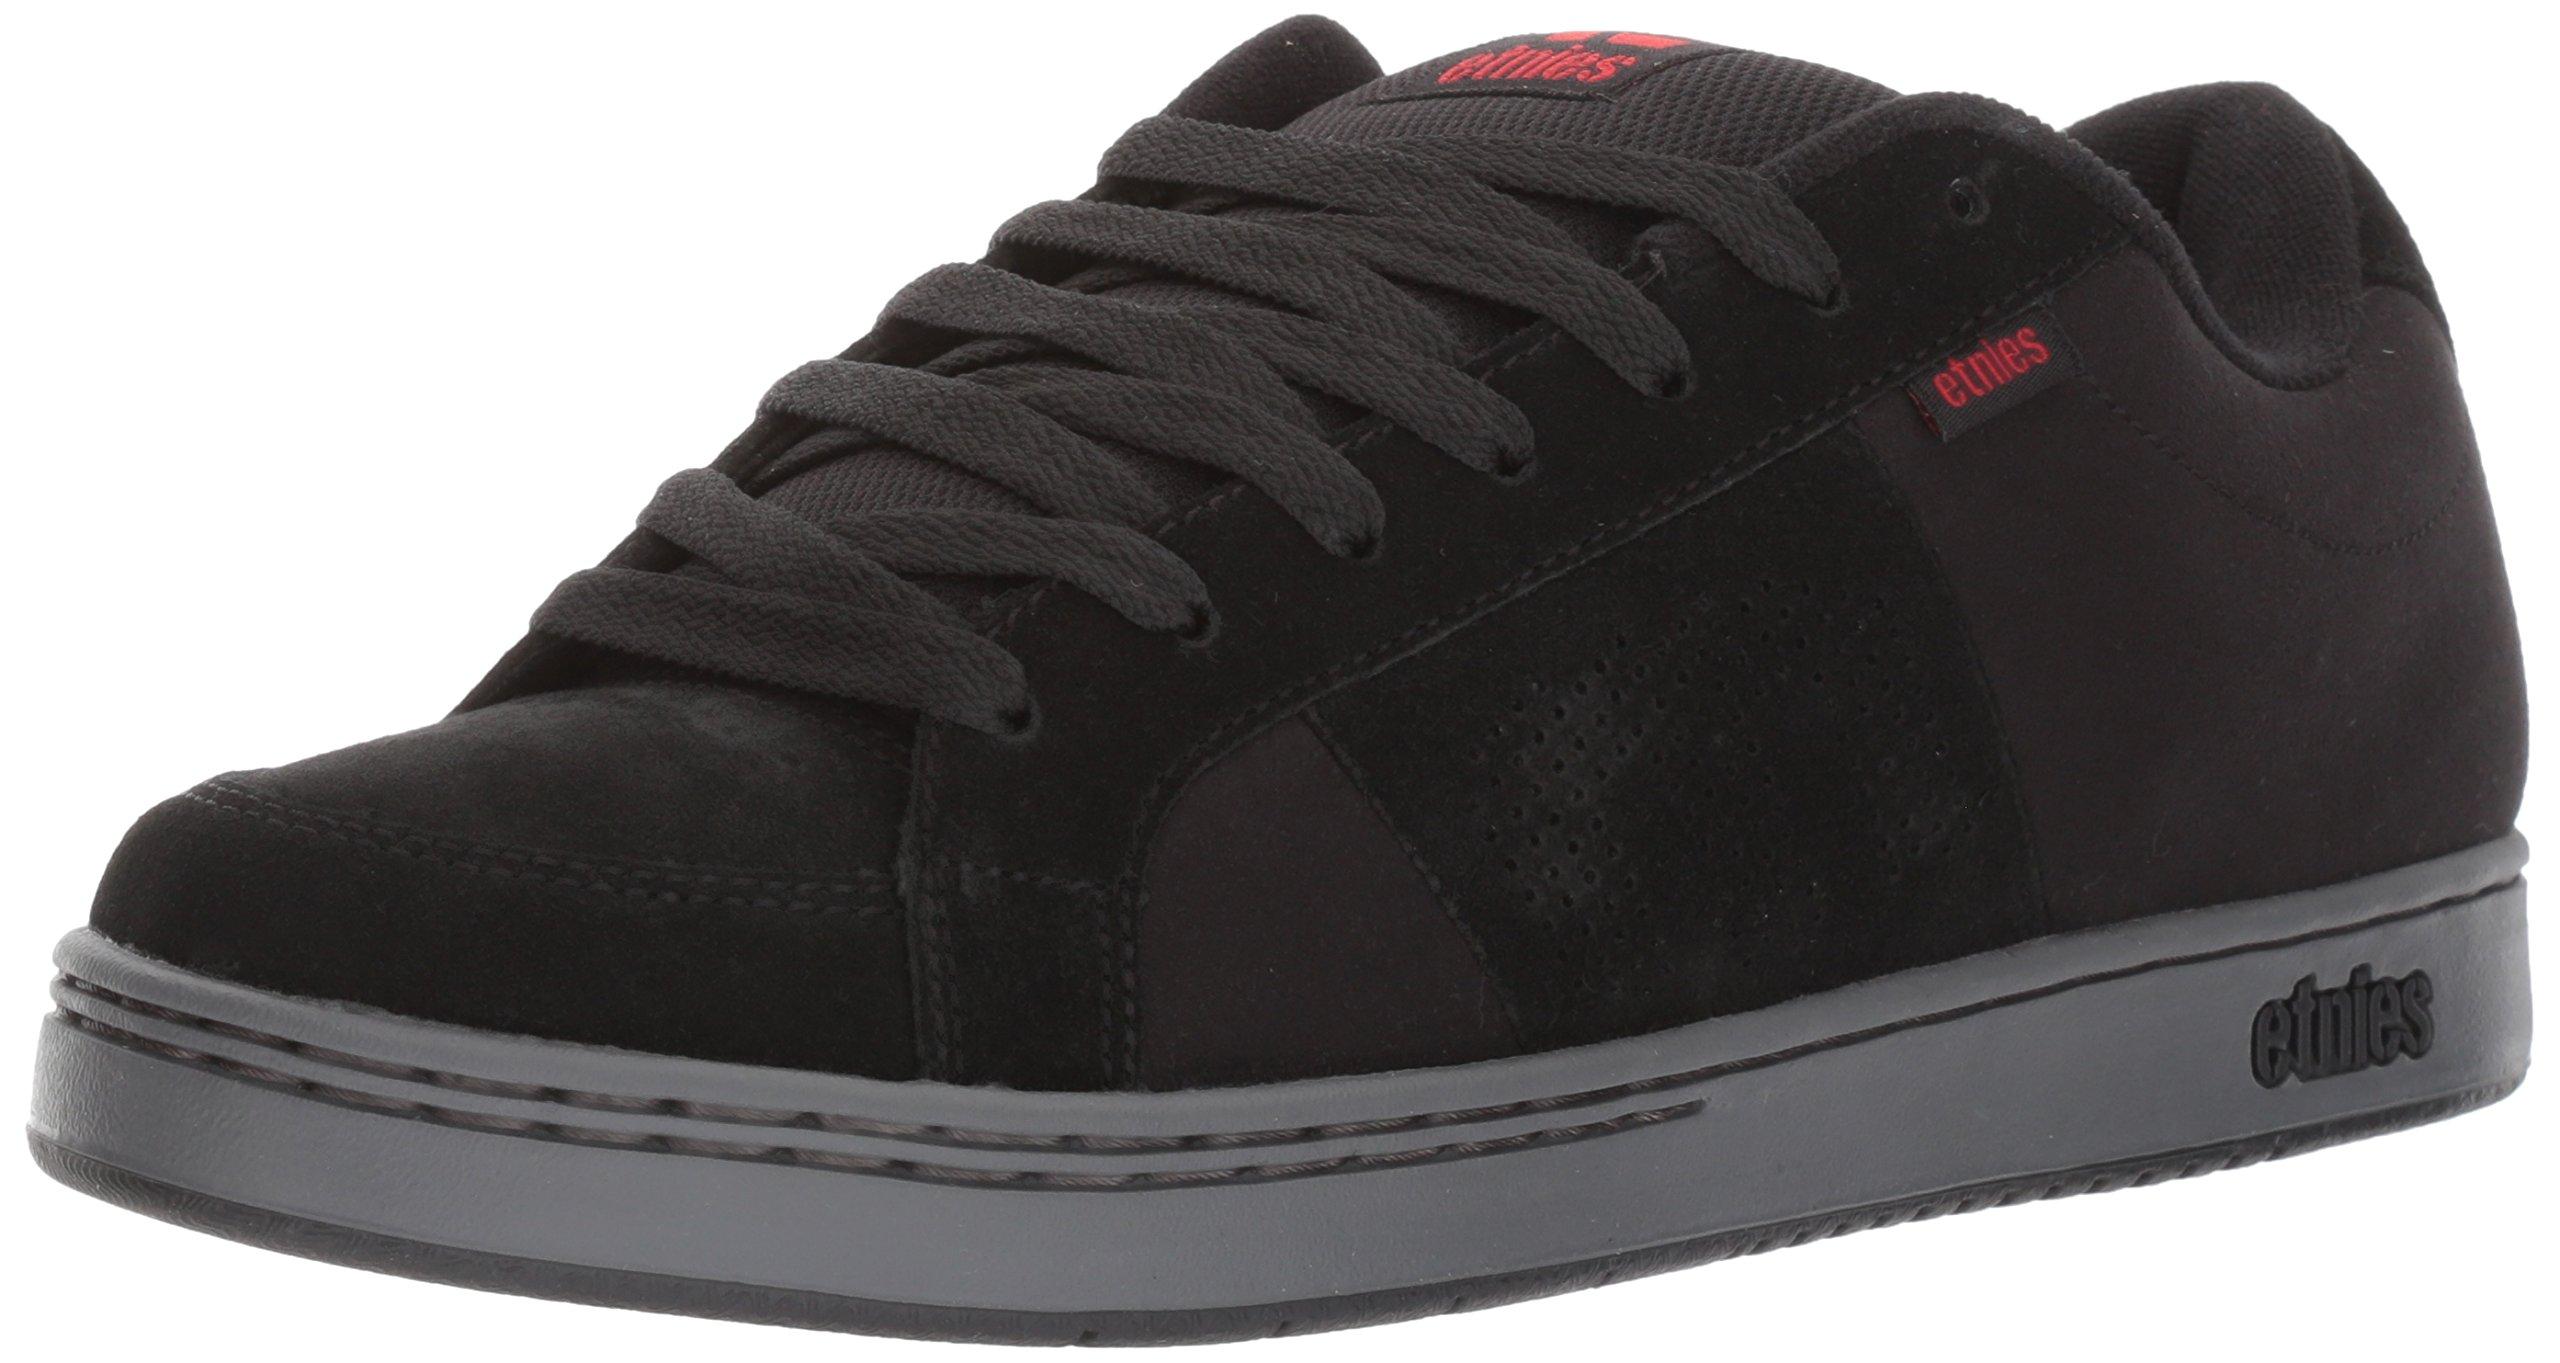 Etnies Mens Men's Kingpin Skate Shoe, Black/Charcoal/red, 7 Medium US